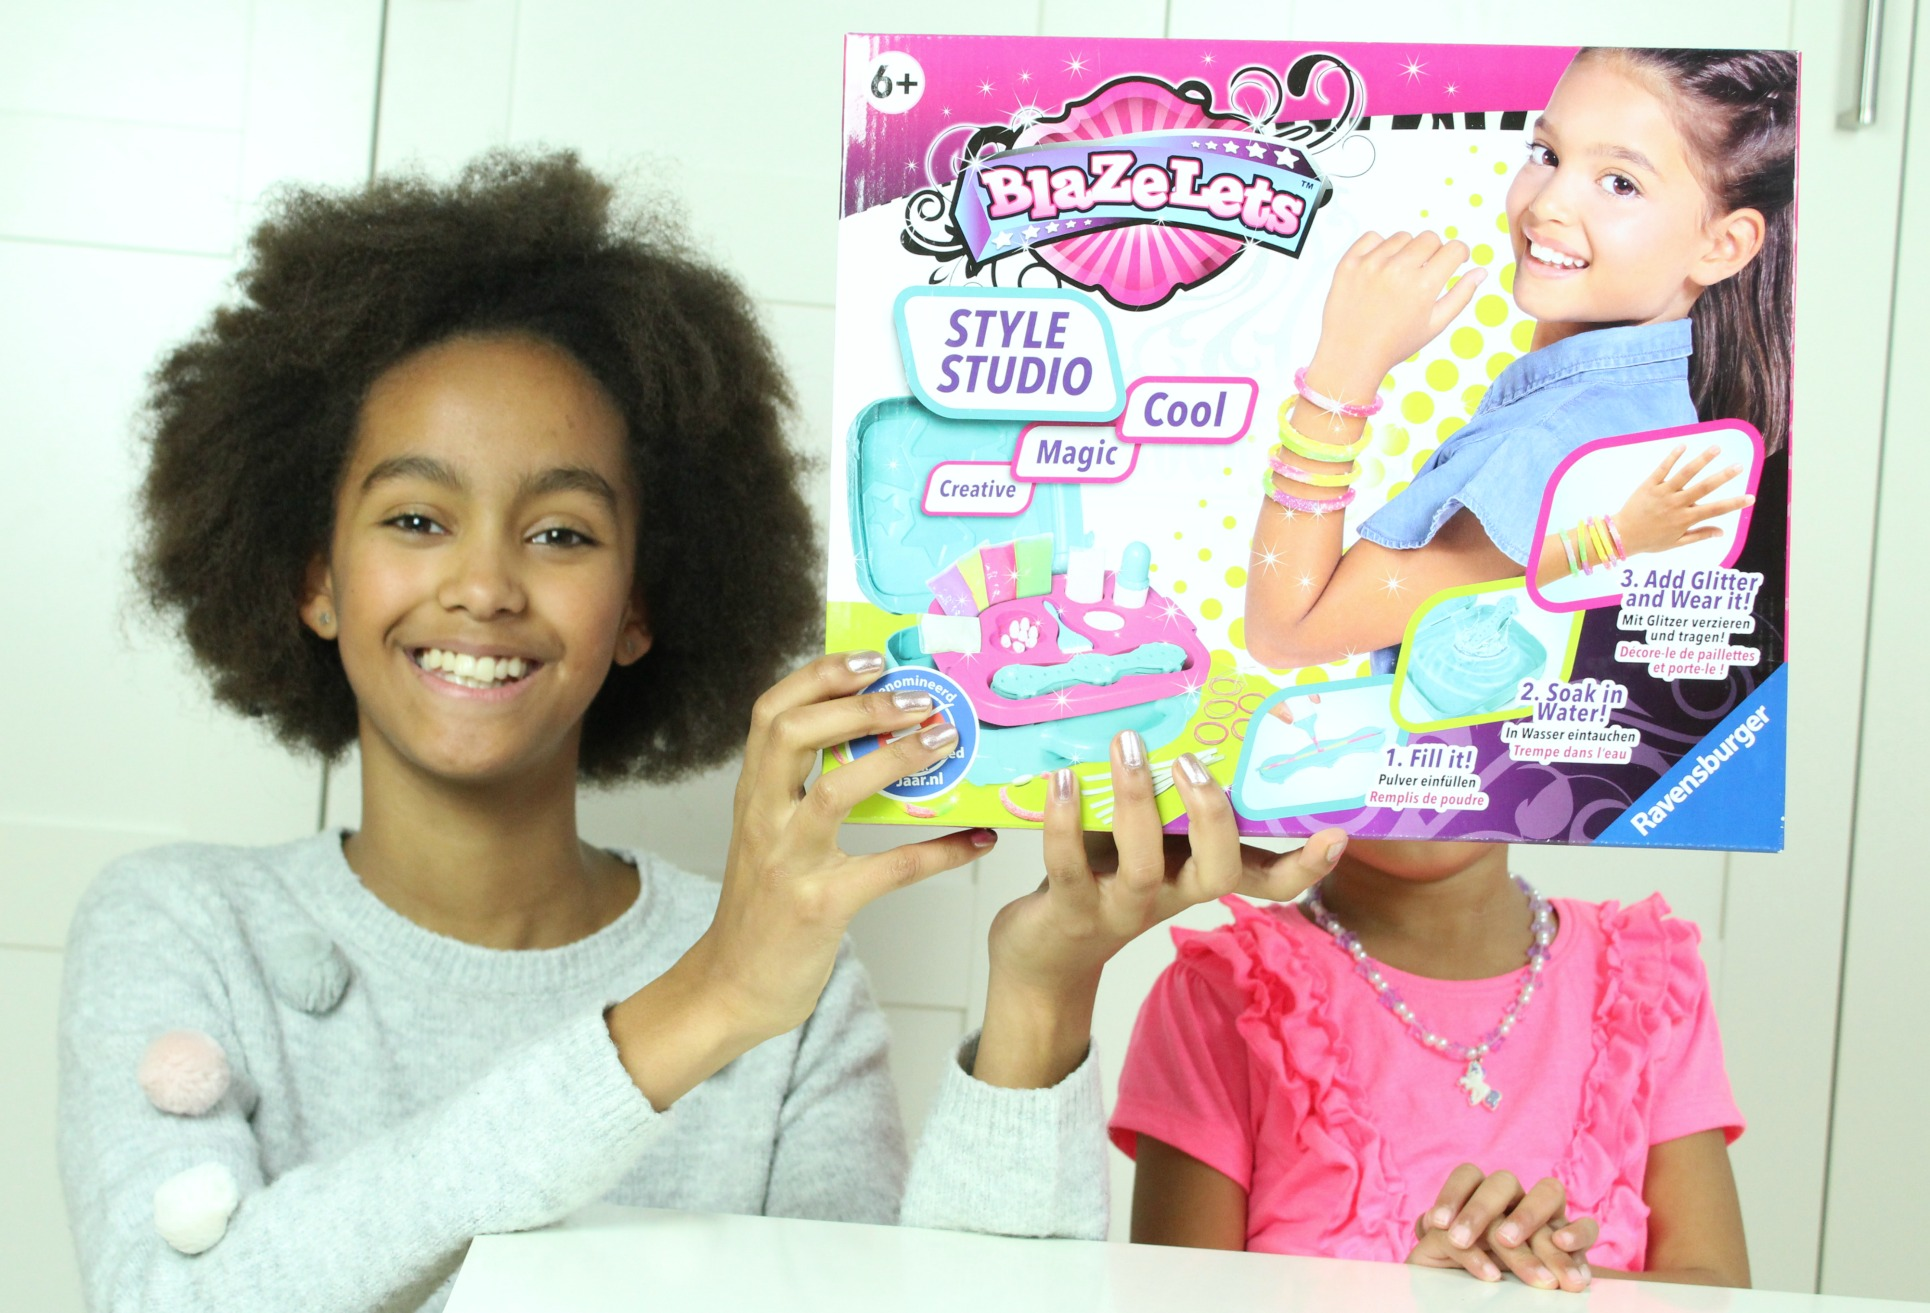 Trends Meisjesspeelgoed Sinterklaas2019_The Millennial Mom